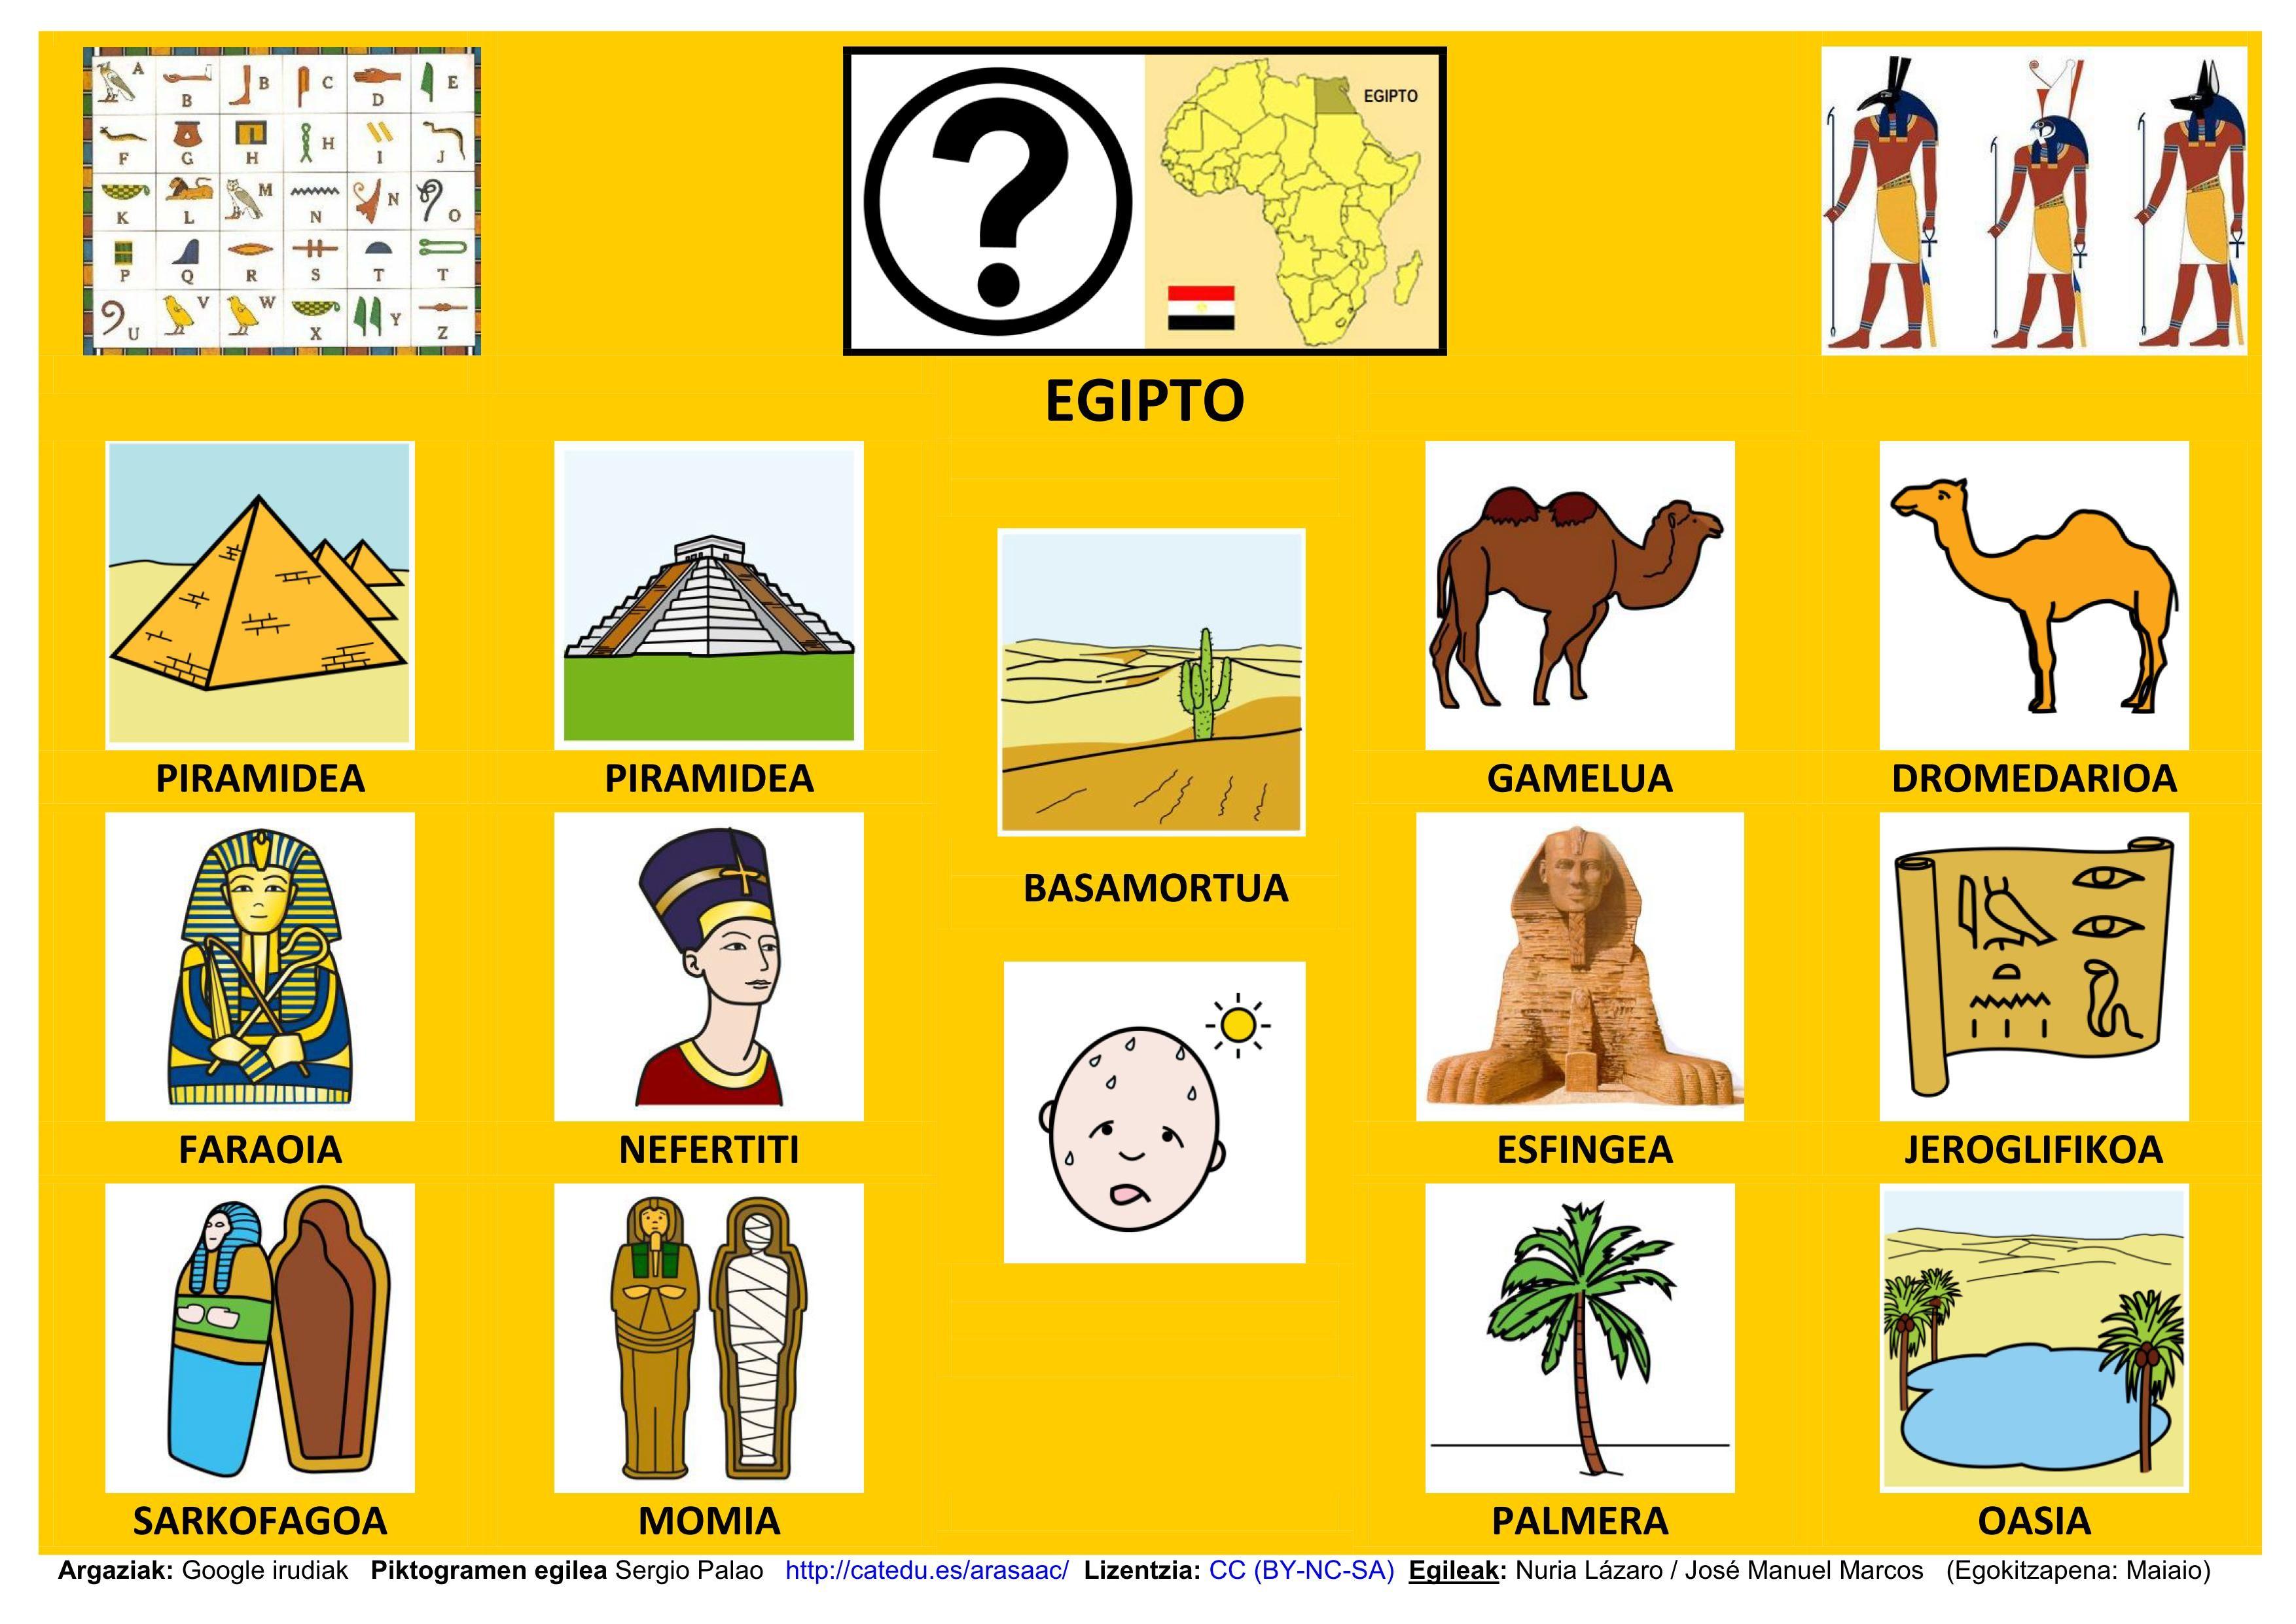 Egipto Adaptación En Euskera De Tablero De Comunicación Arasaac Fotos Google Imágenes Pictogramas Arasa Tableros De Comunicación Egipto Google Imagenes